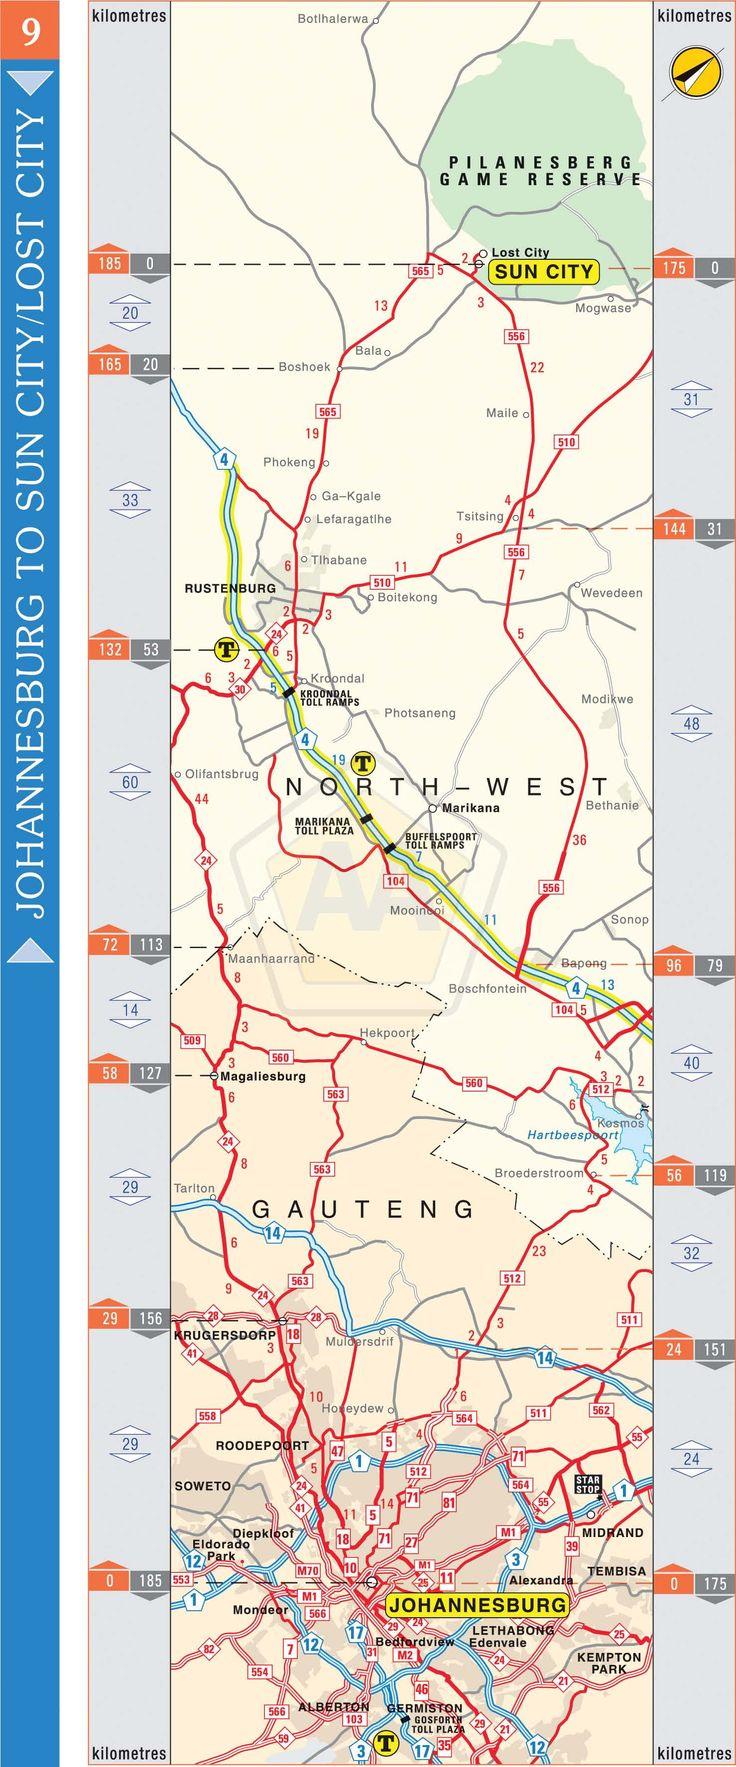 Johannesburg to Sun City via Rustenburg | Automobile Association